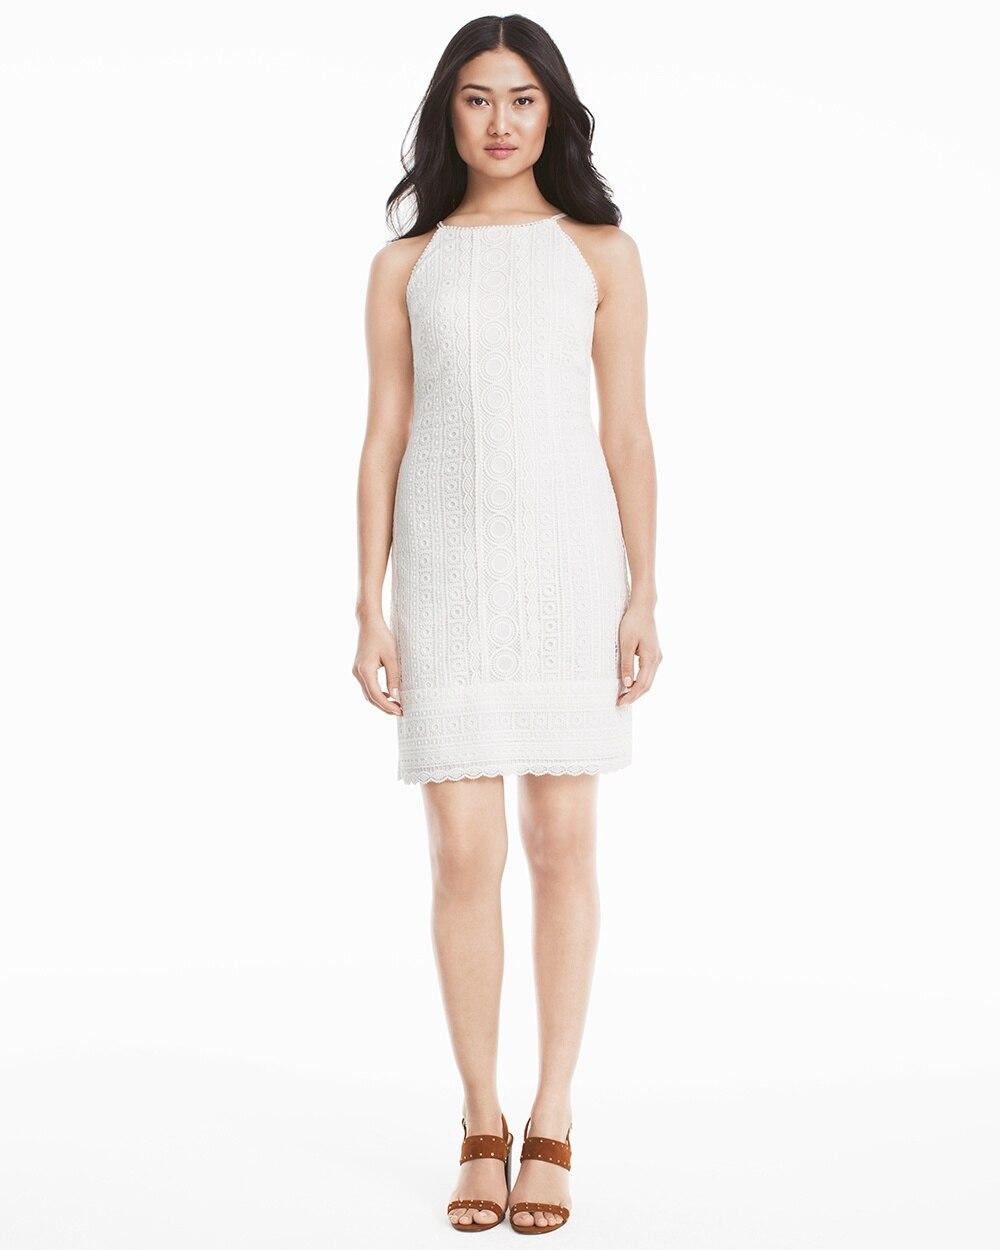 Sleeveless White Lace Shift Dress - WHBM